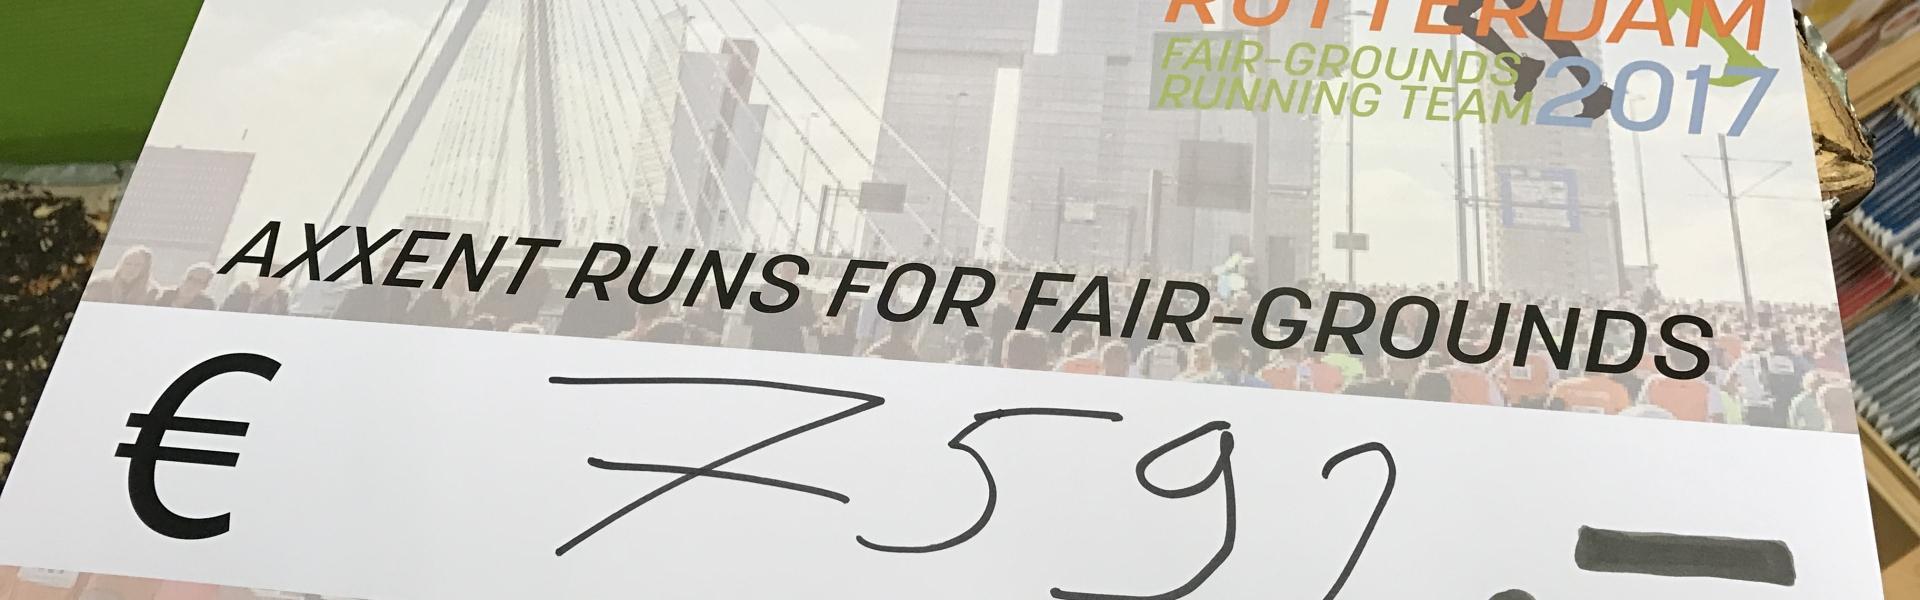 Interim score sponsor activity Fair-grounds running team